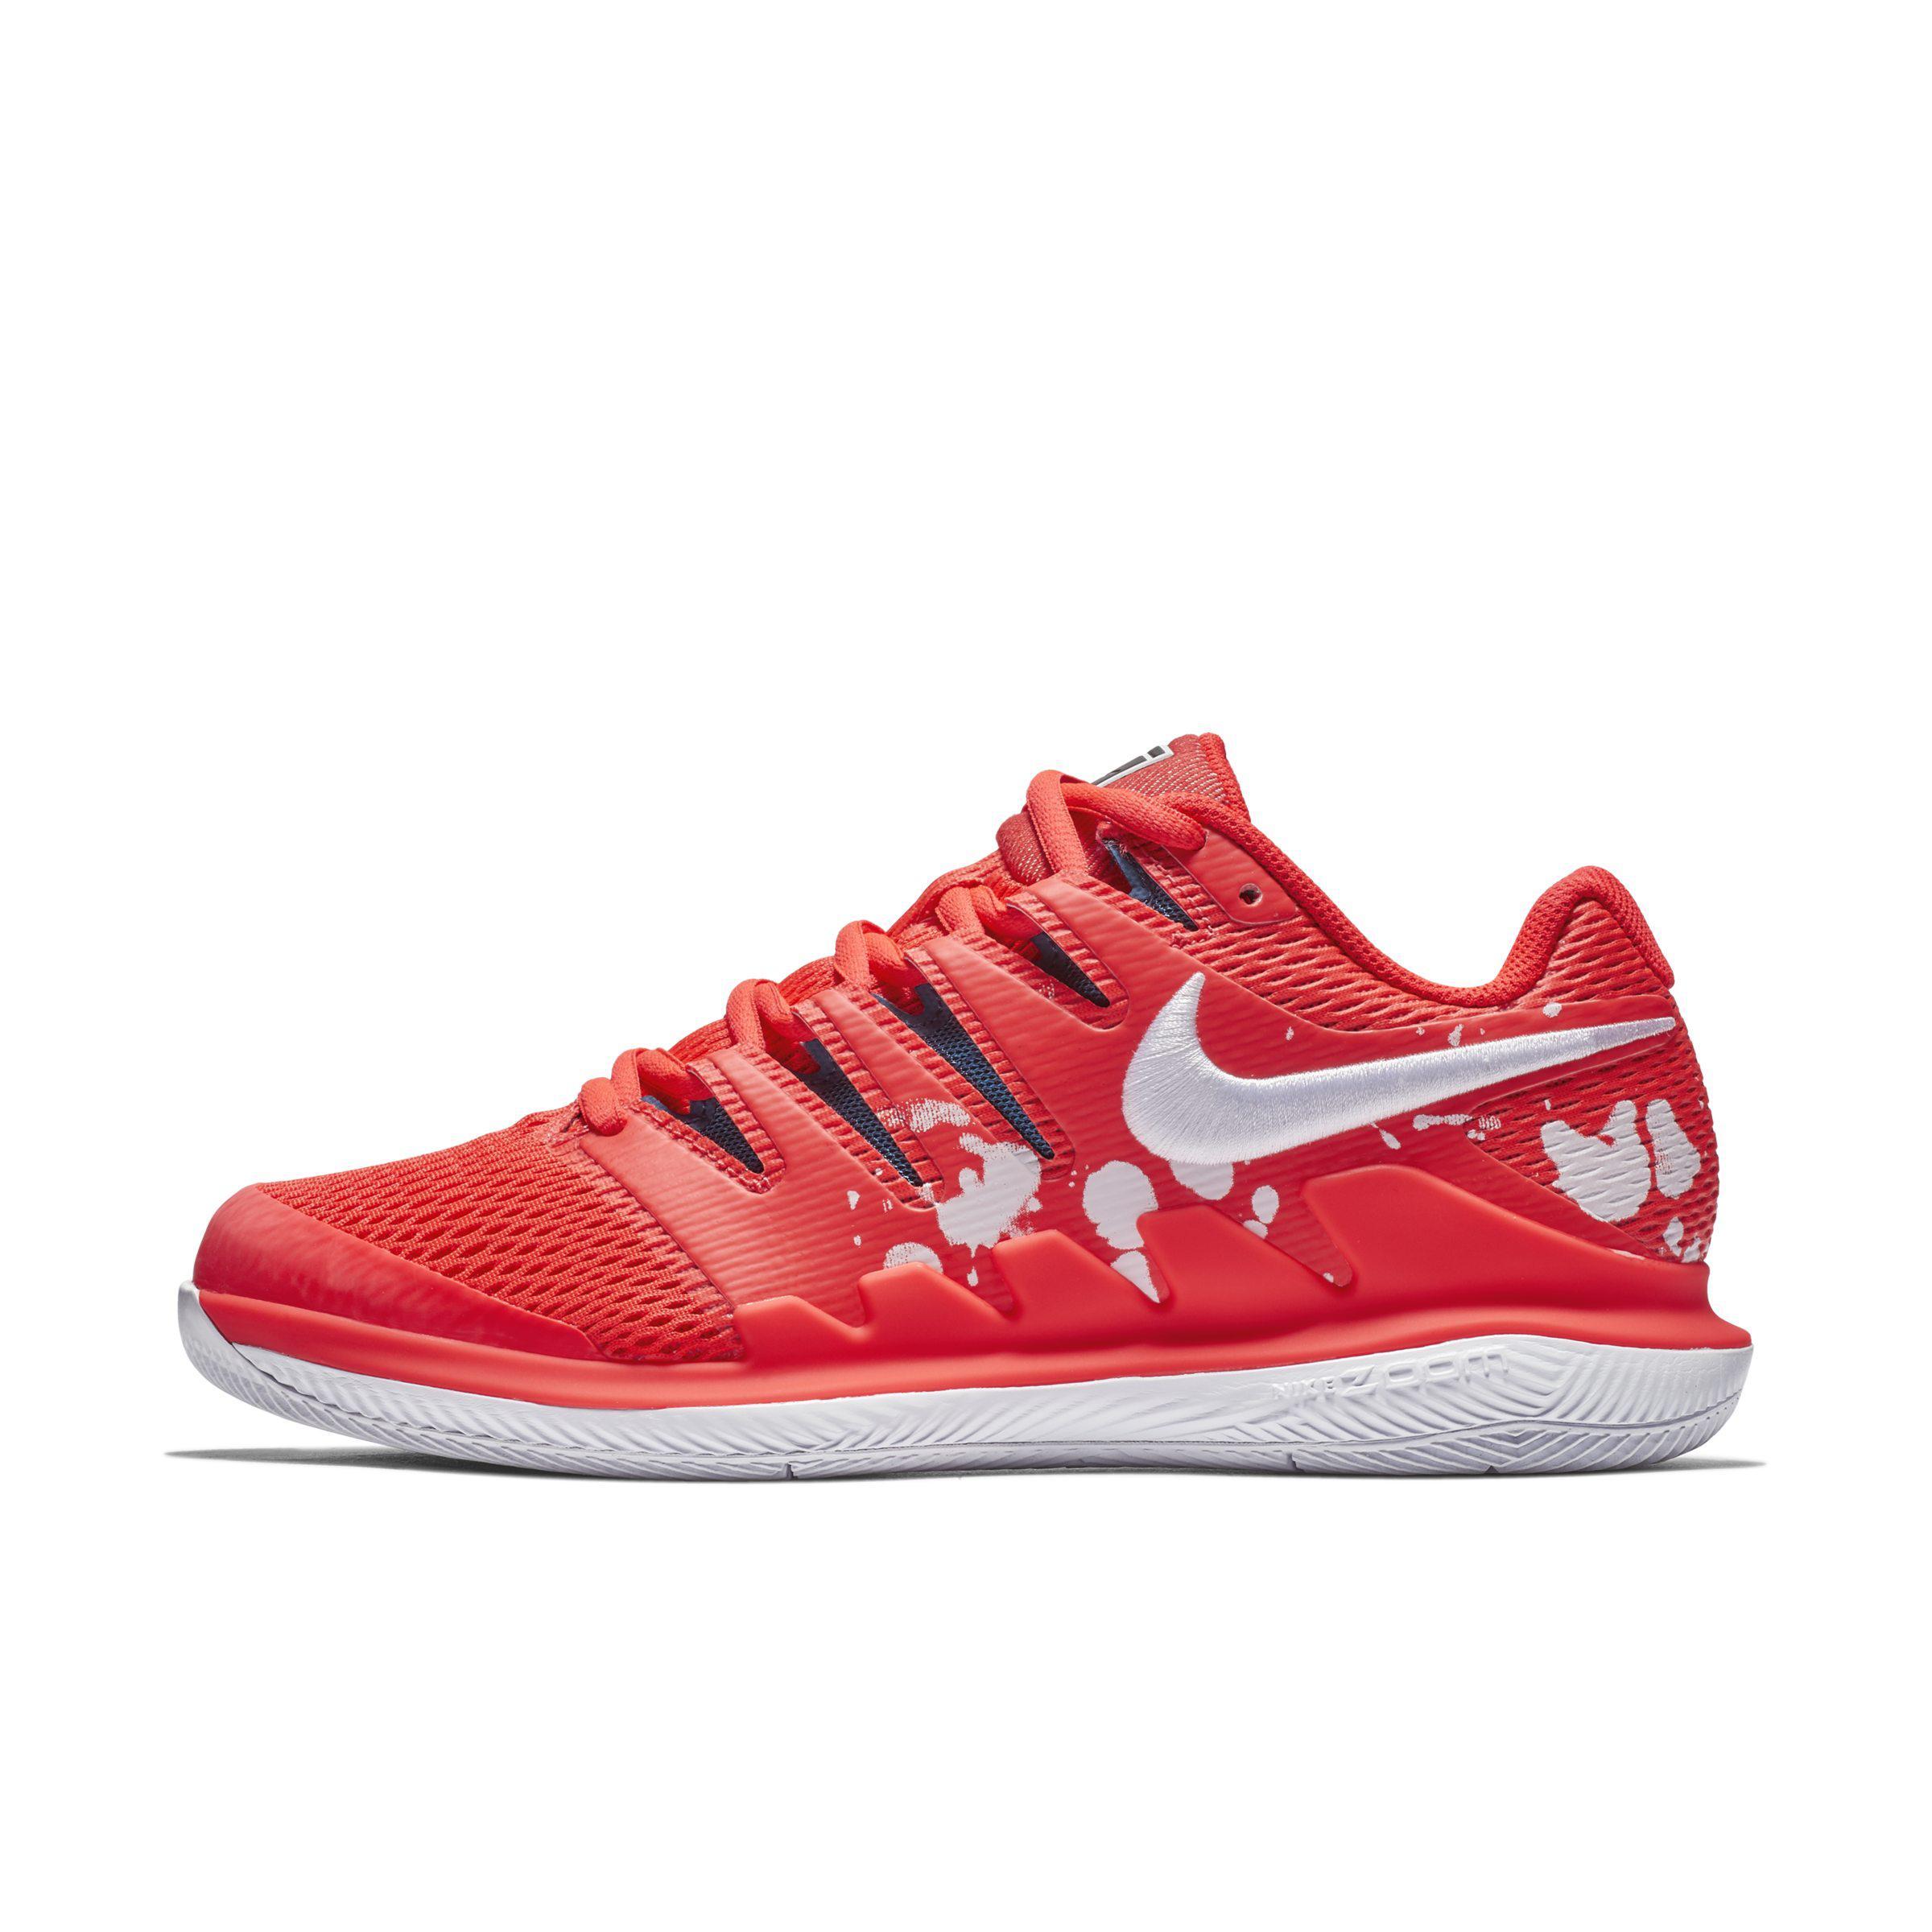 Nike Court Air Zoom Vapor X Hard Court Tennis Shoe in Red - Lyst c527cc070